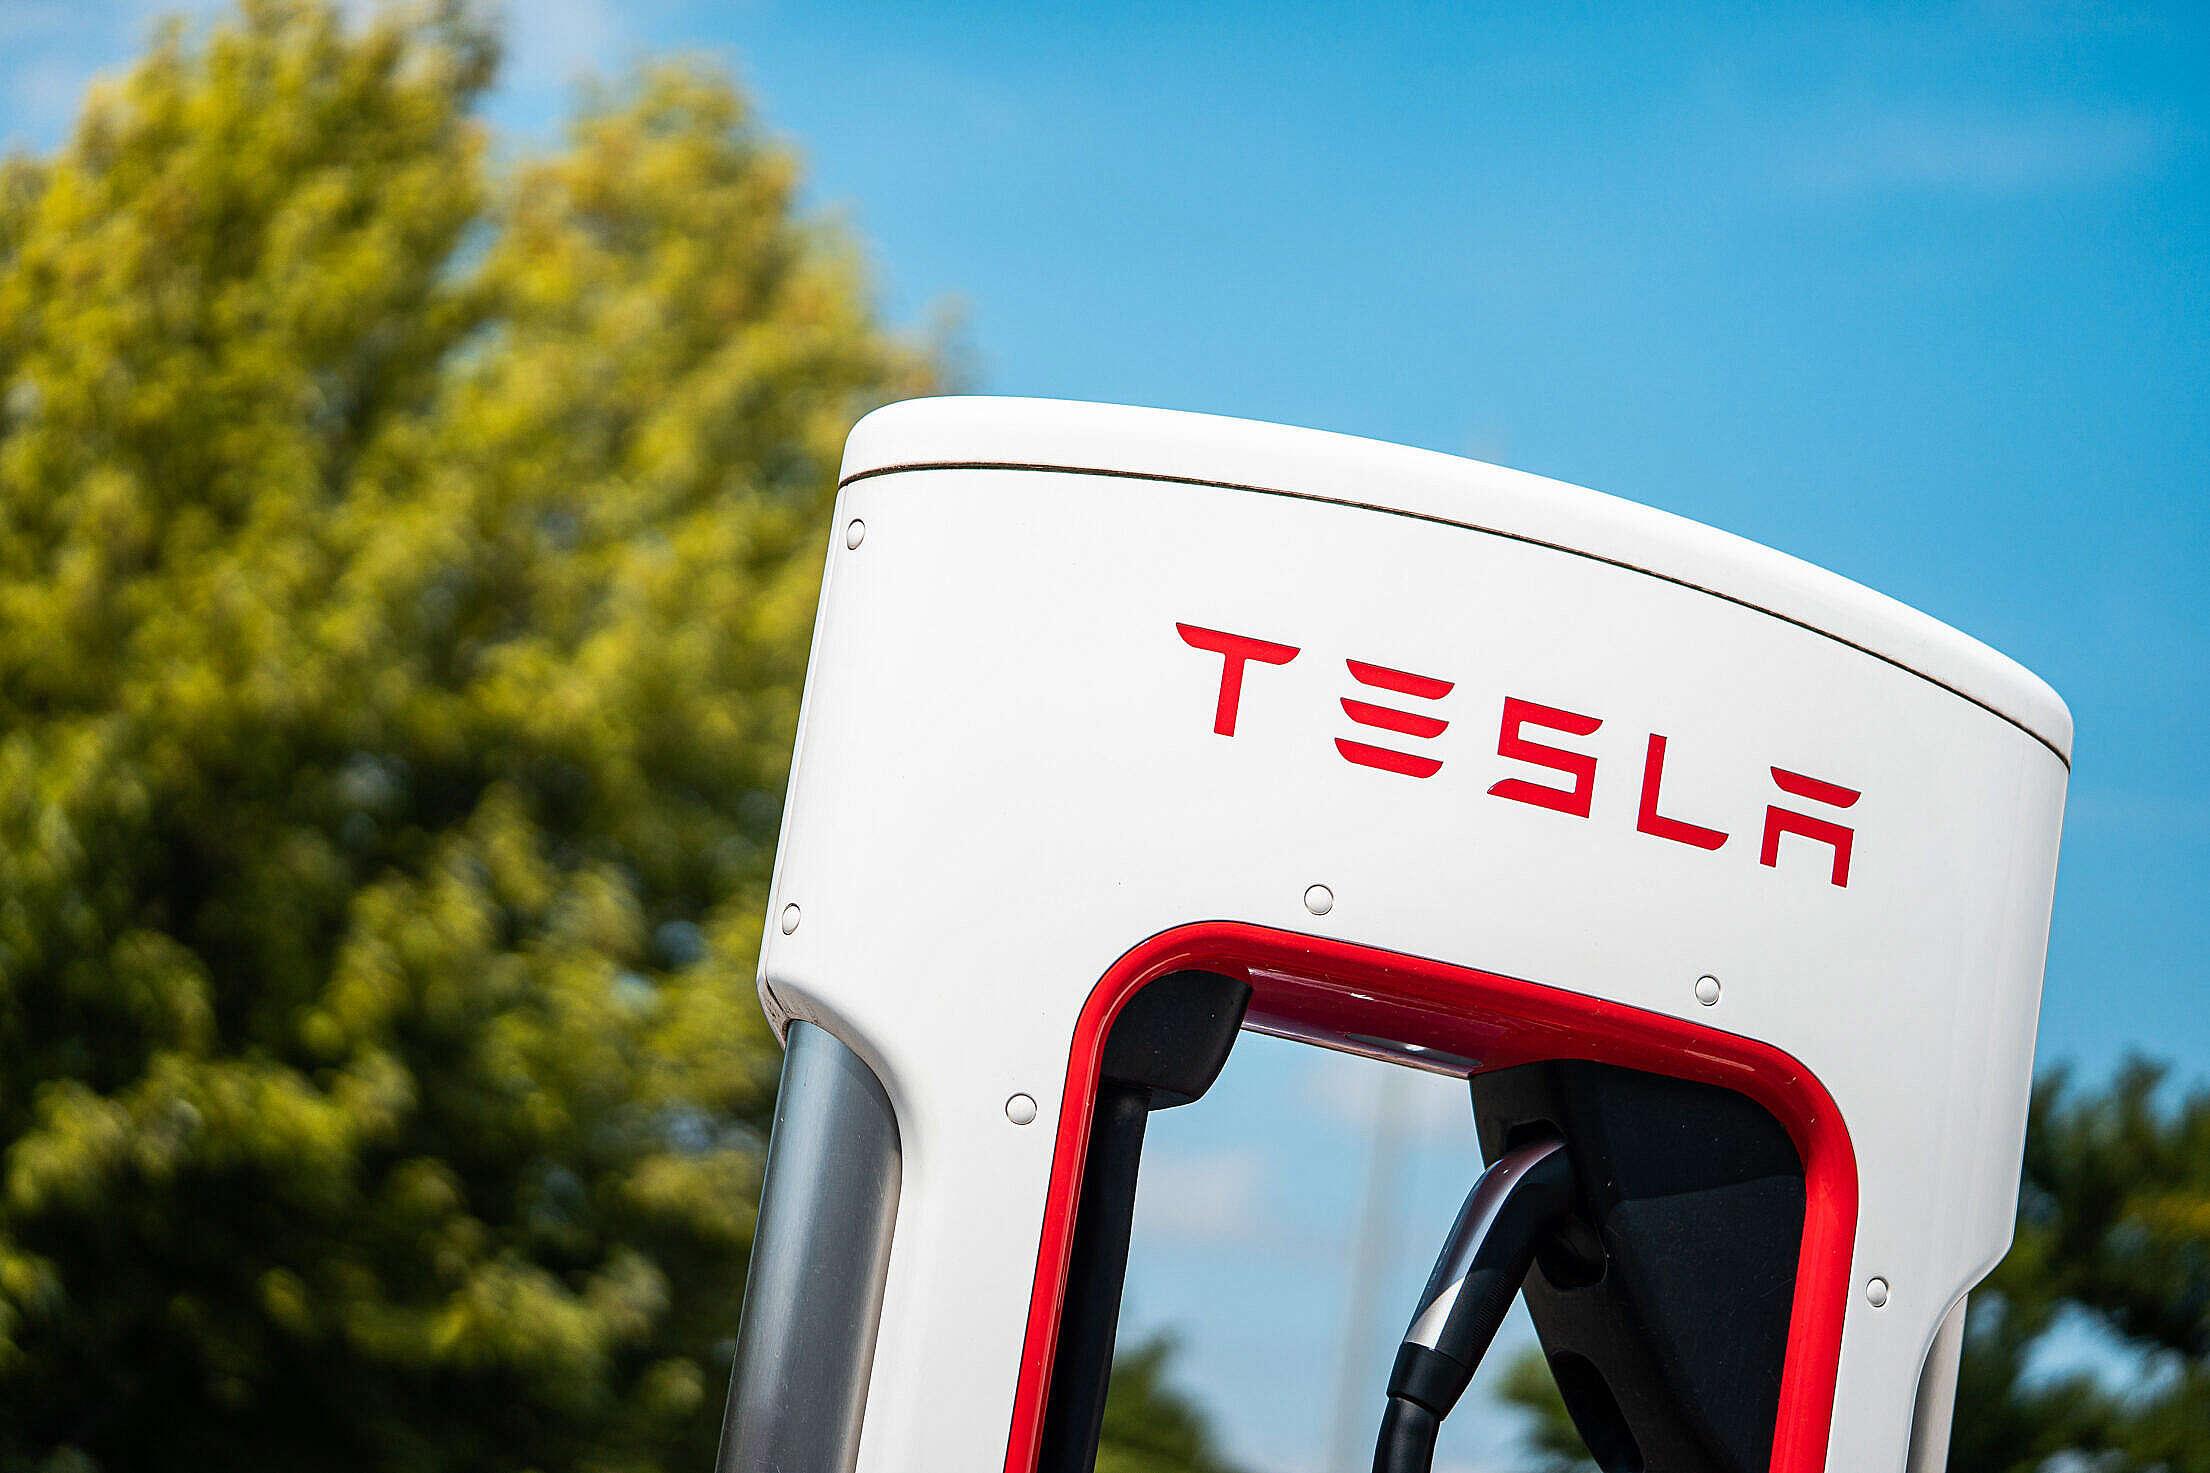 Tesla Charging Station Free Stock Photo